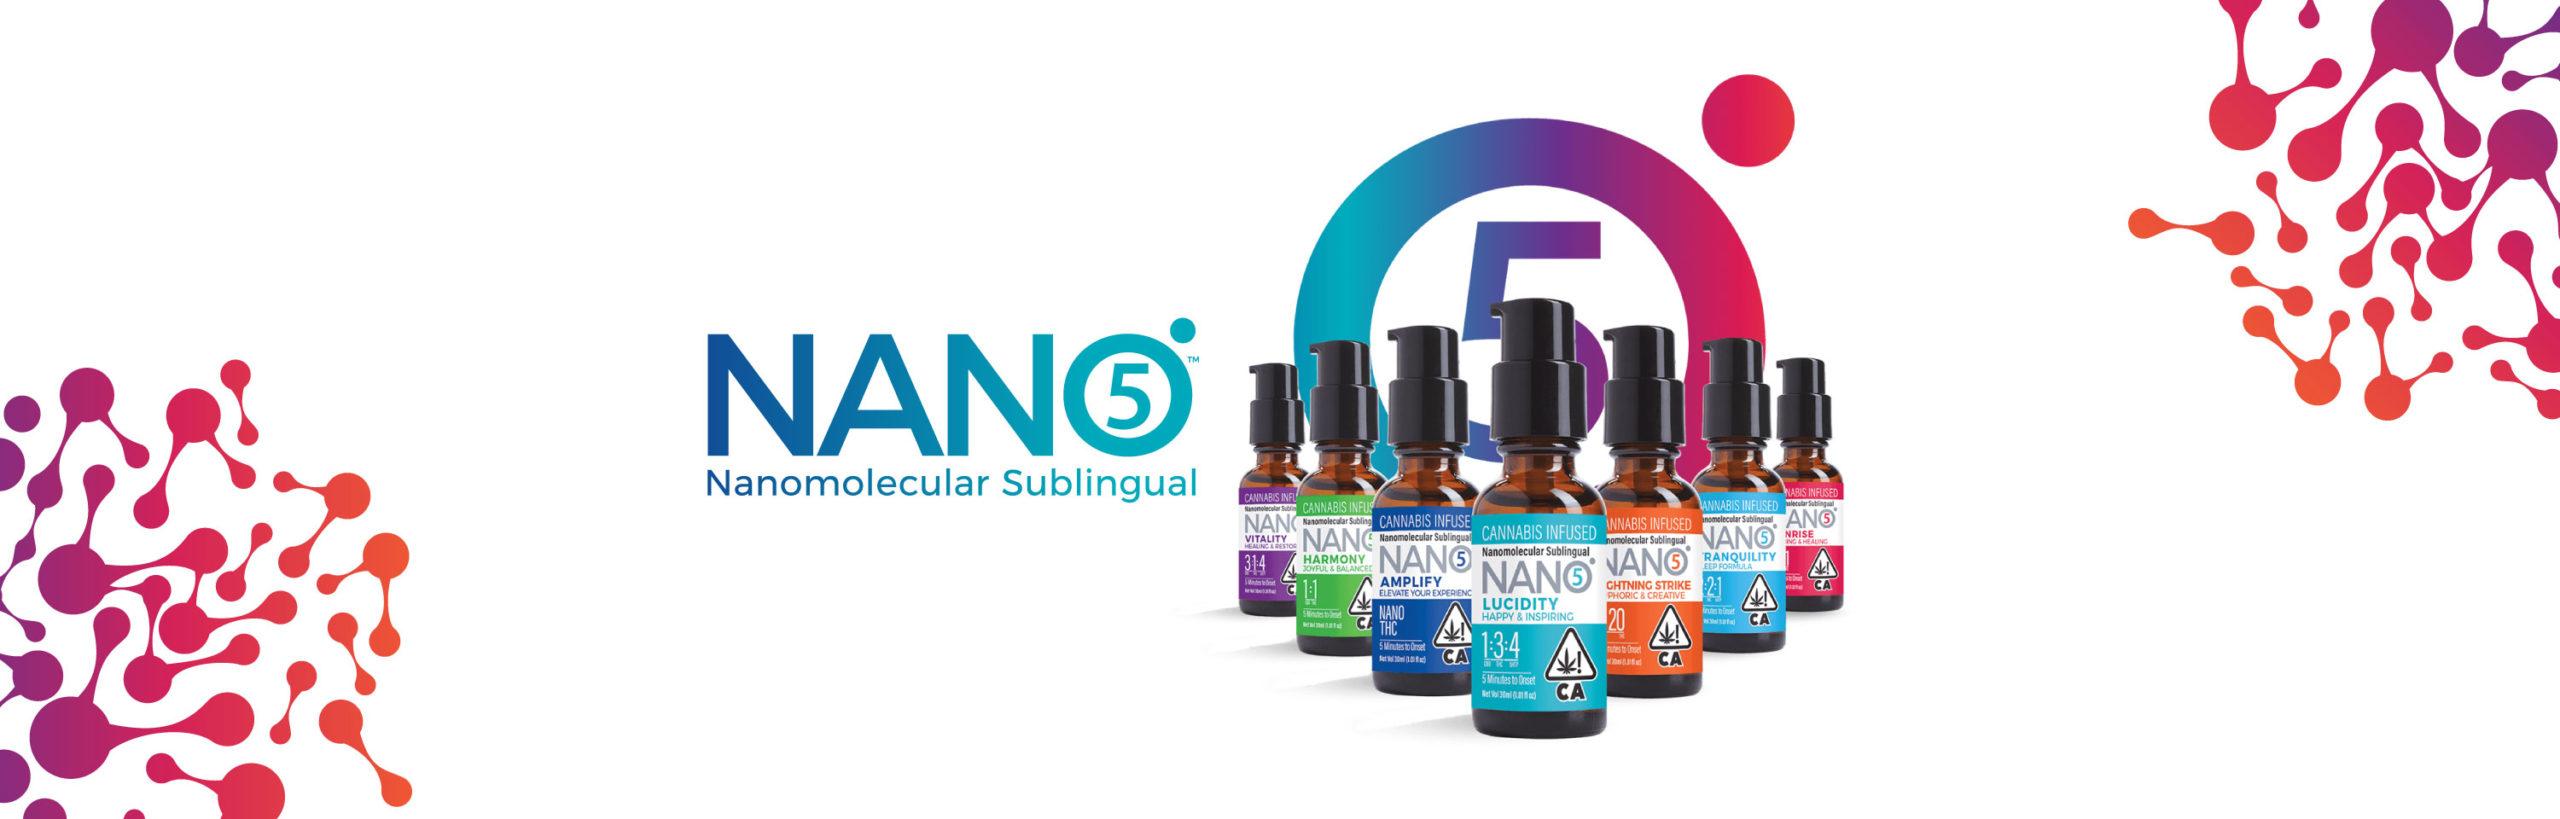 nano5-slider-scaled.jpg